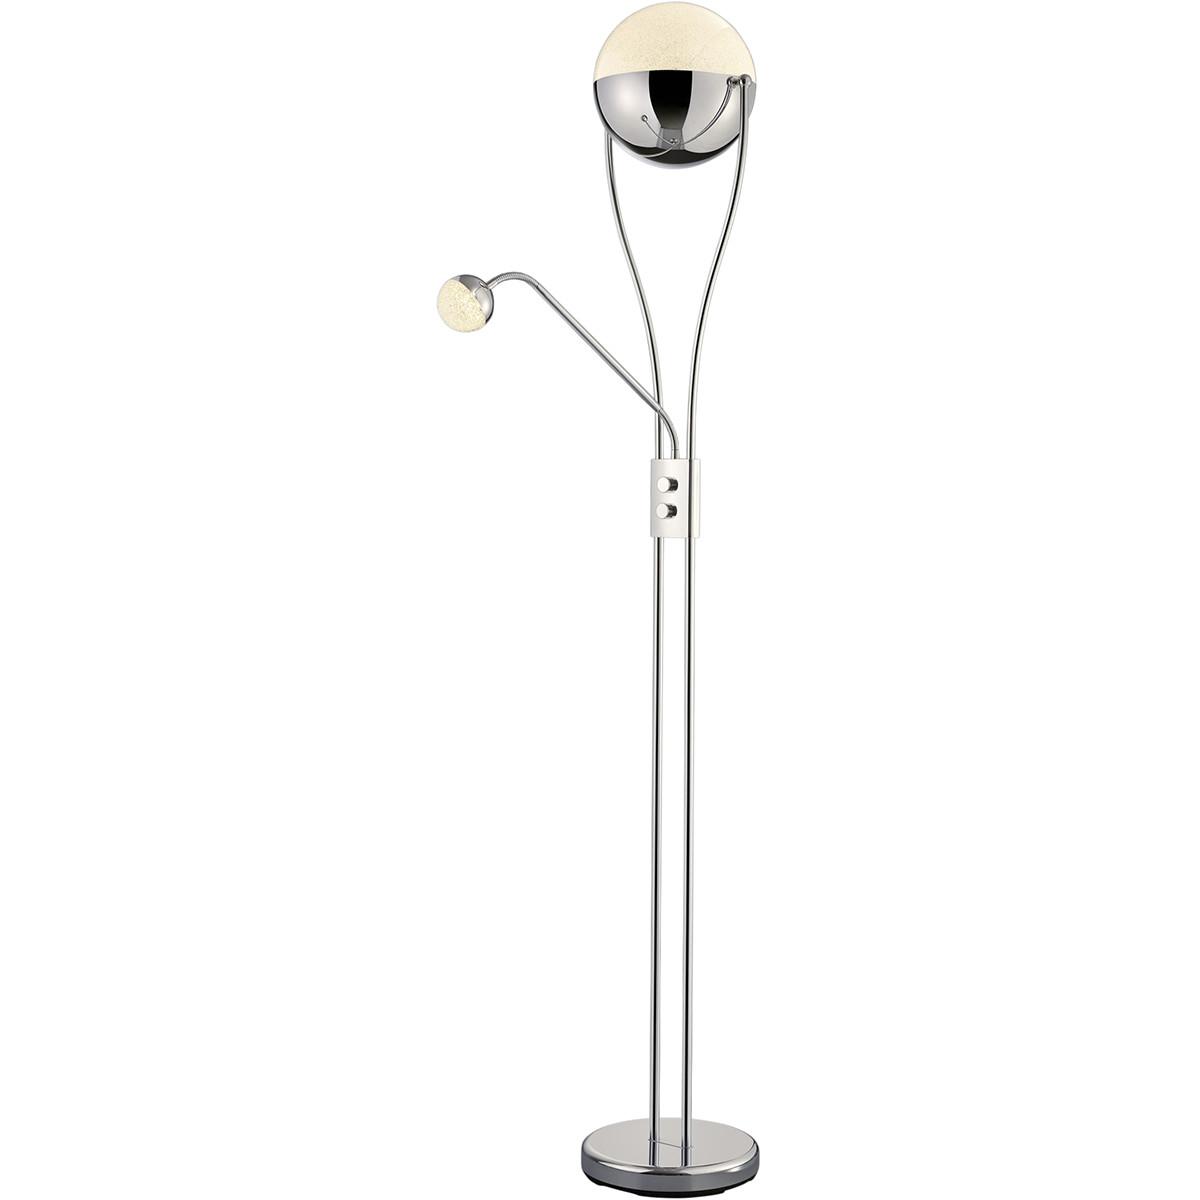 LED Vloerlamp - Trion Chiso - 25W - Warm Wit 3000K - 2-lichts - Dimbaar - Rond - Glans Chroom - Alum